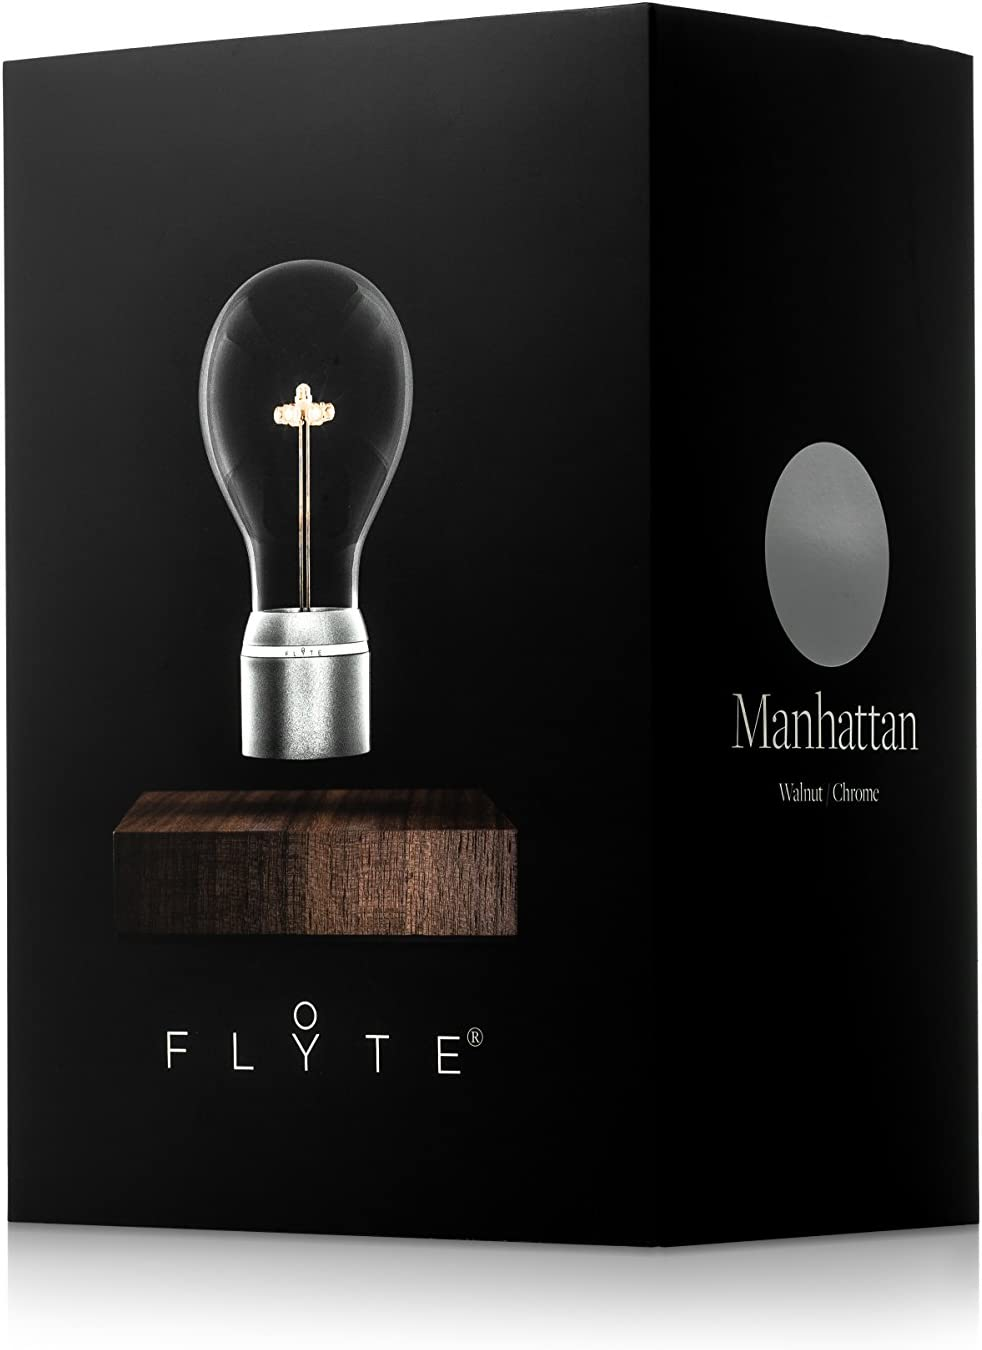 FLYTE Royal - Original, Echte Schwebende LED Glühbirne Lampe (Basis aus Eichenholz, Glühbirnenkappe aus Gold) [Energieklasse B] Chrom